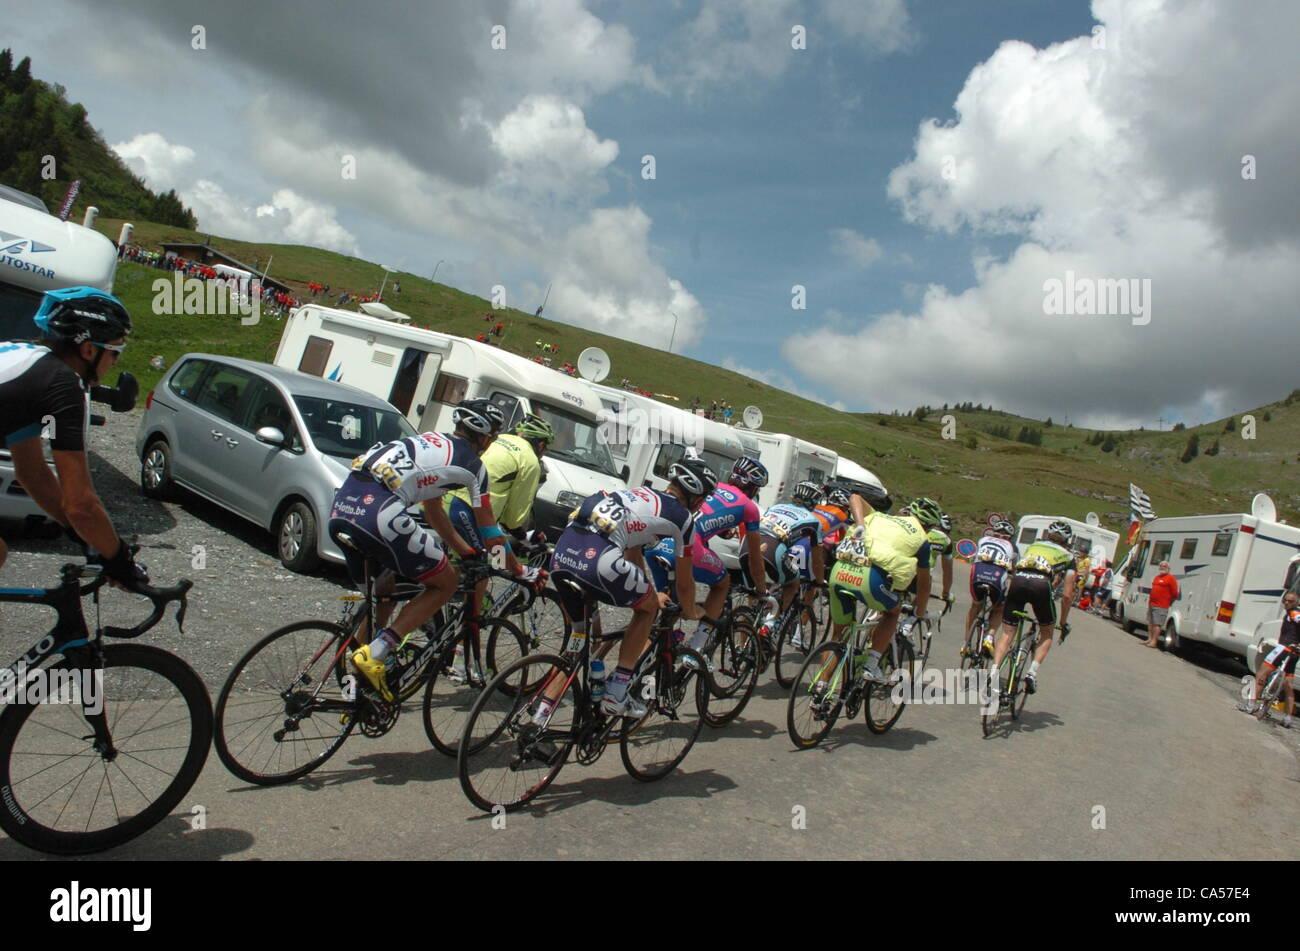 09.06.2012.  Criterium du Dauphine Libere, stage 06 Saint Alban Leysse - Morzine, Lotto - Belisol 2012, Joux Plane Stock Photo